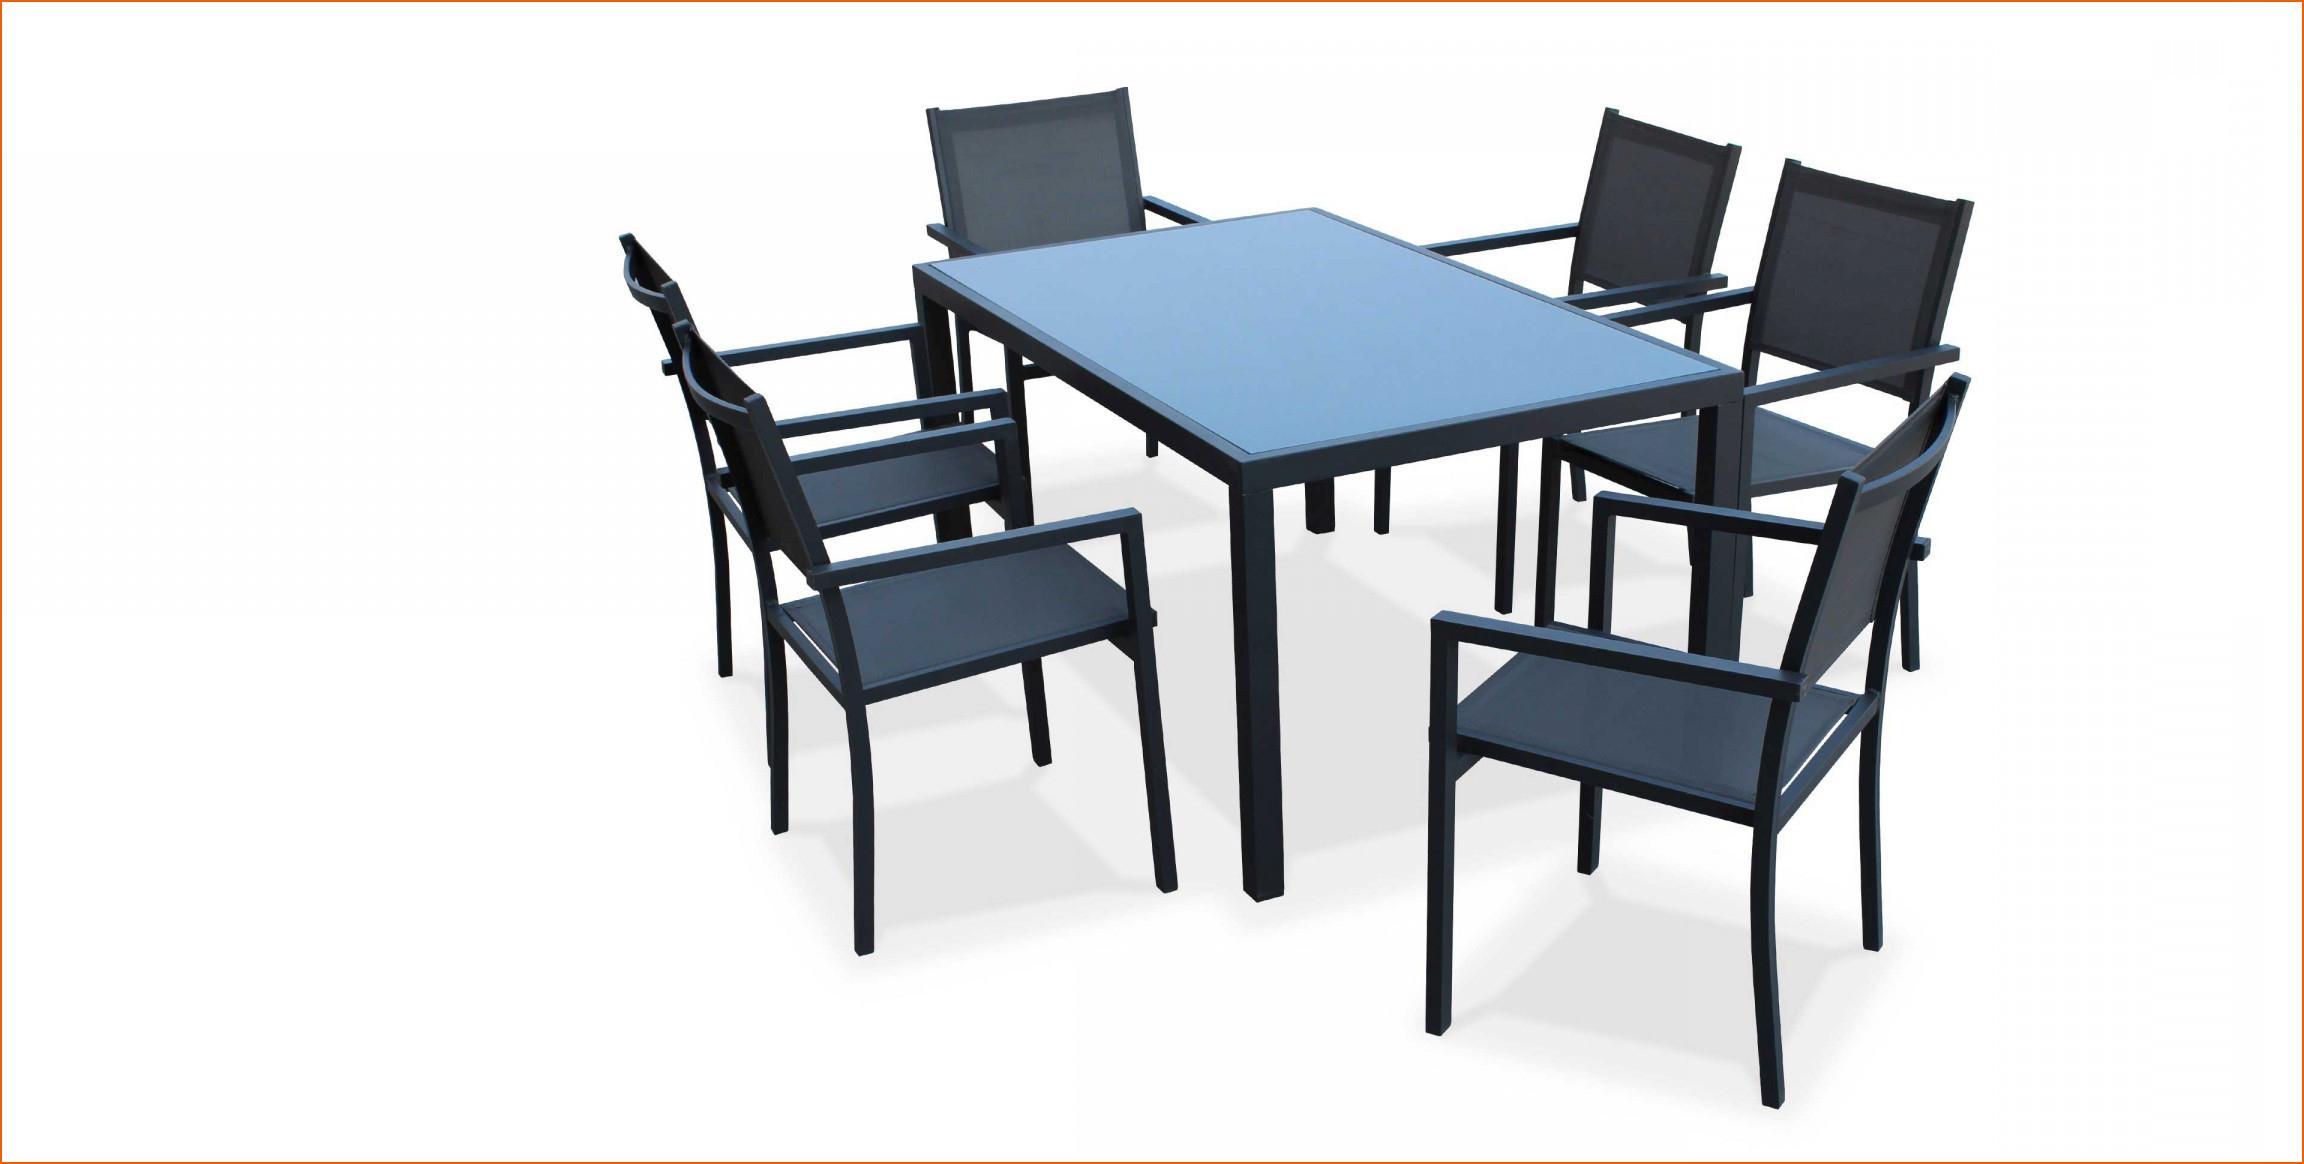 Impressionnant Table De Jardin Bois Pliante avec Table De Jardin Leclerc